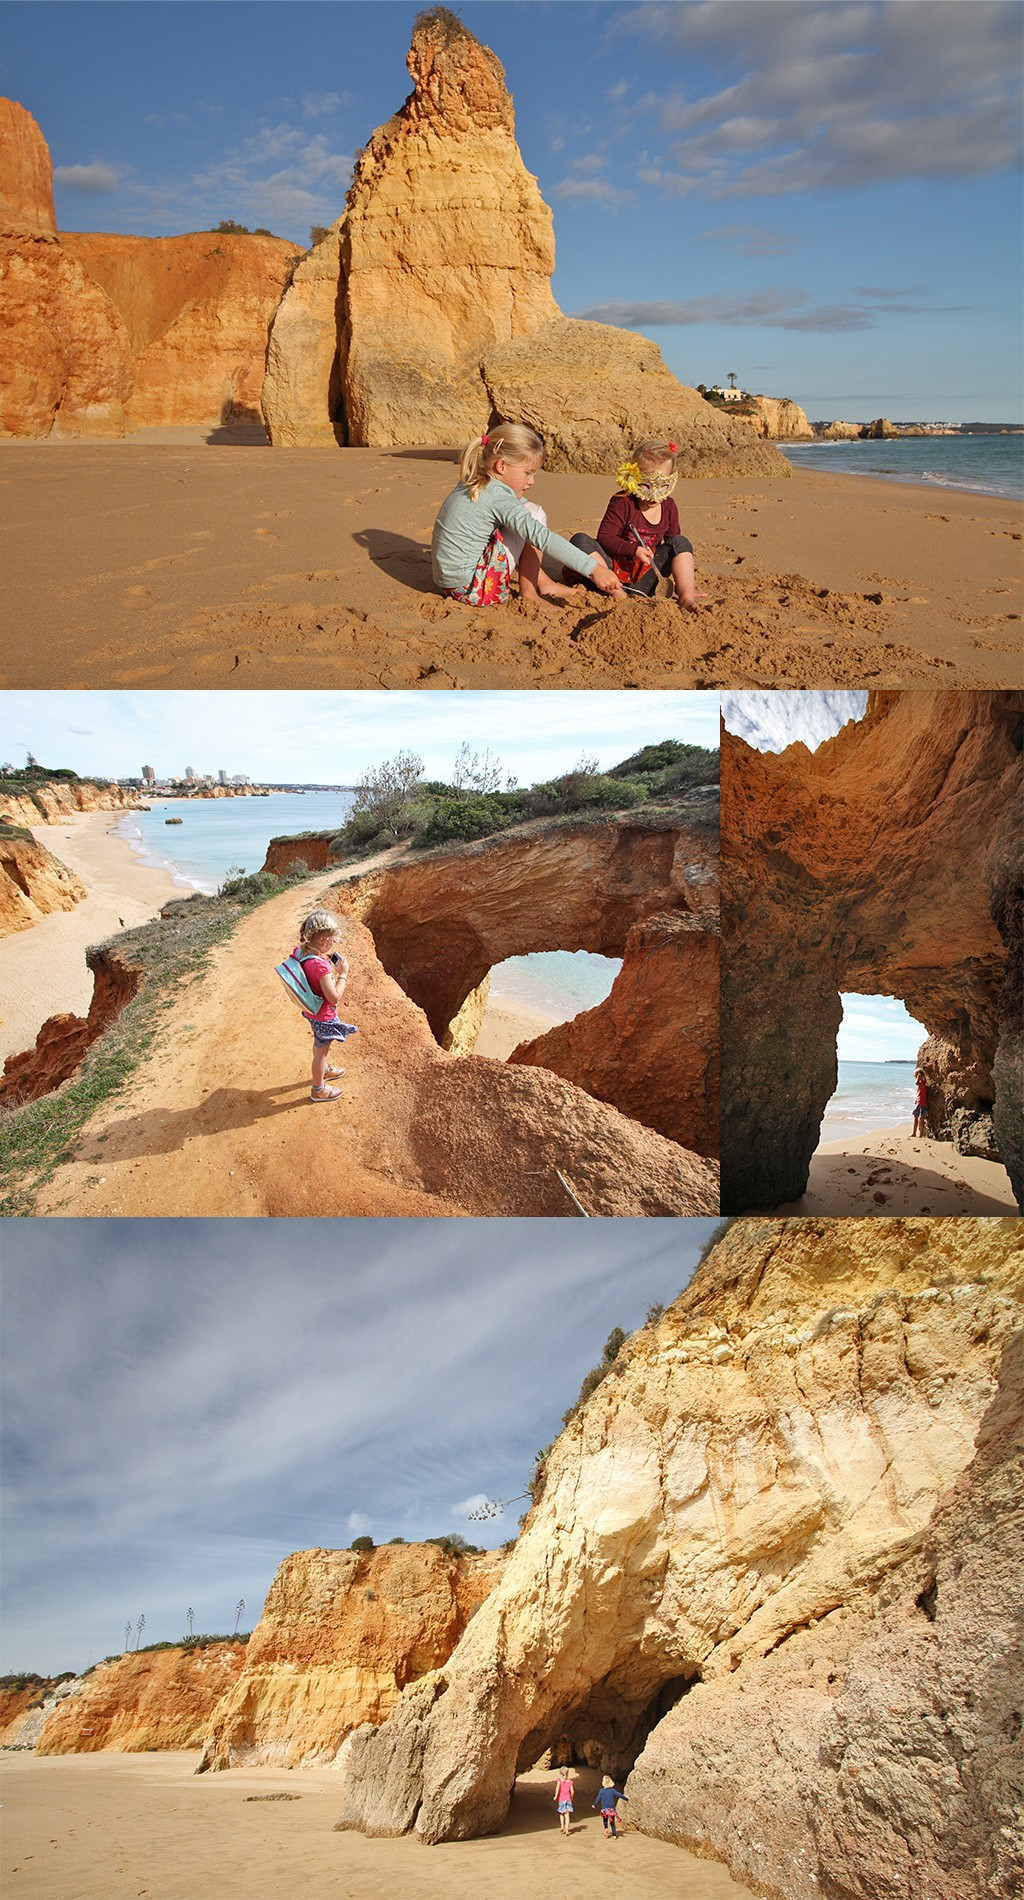 mooiste stranden Algarve bij accommodatie